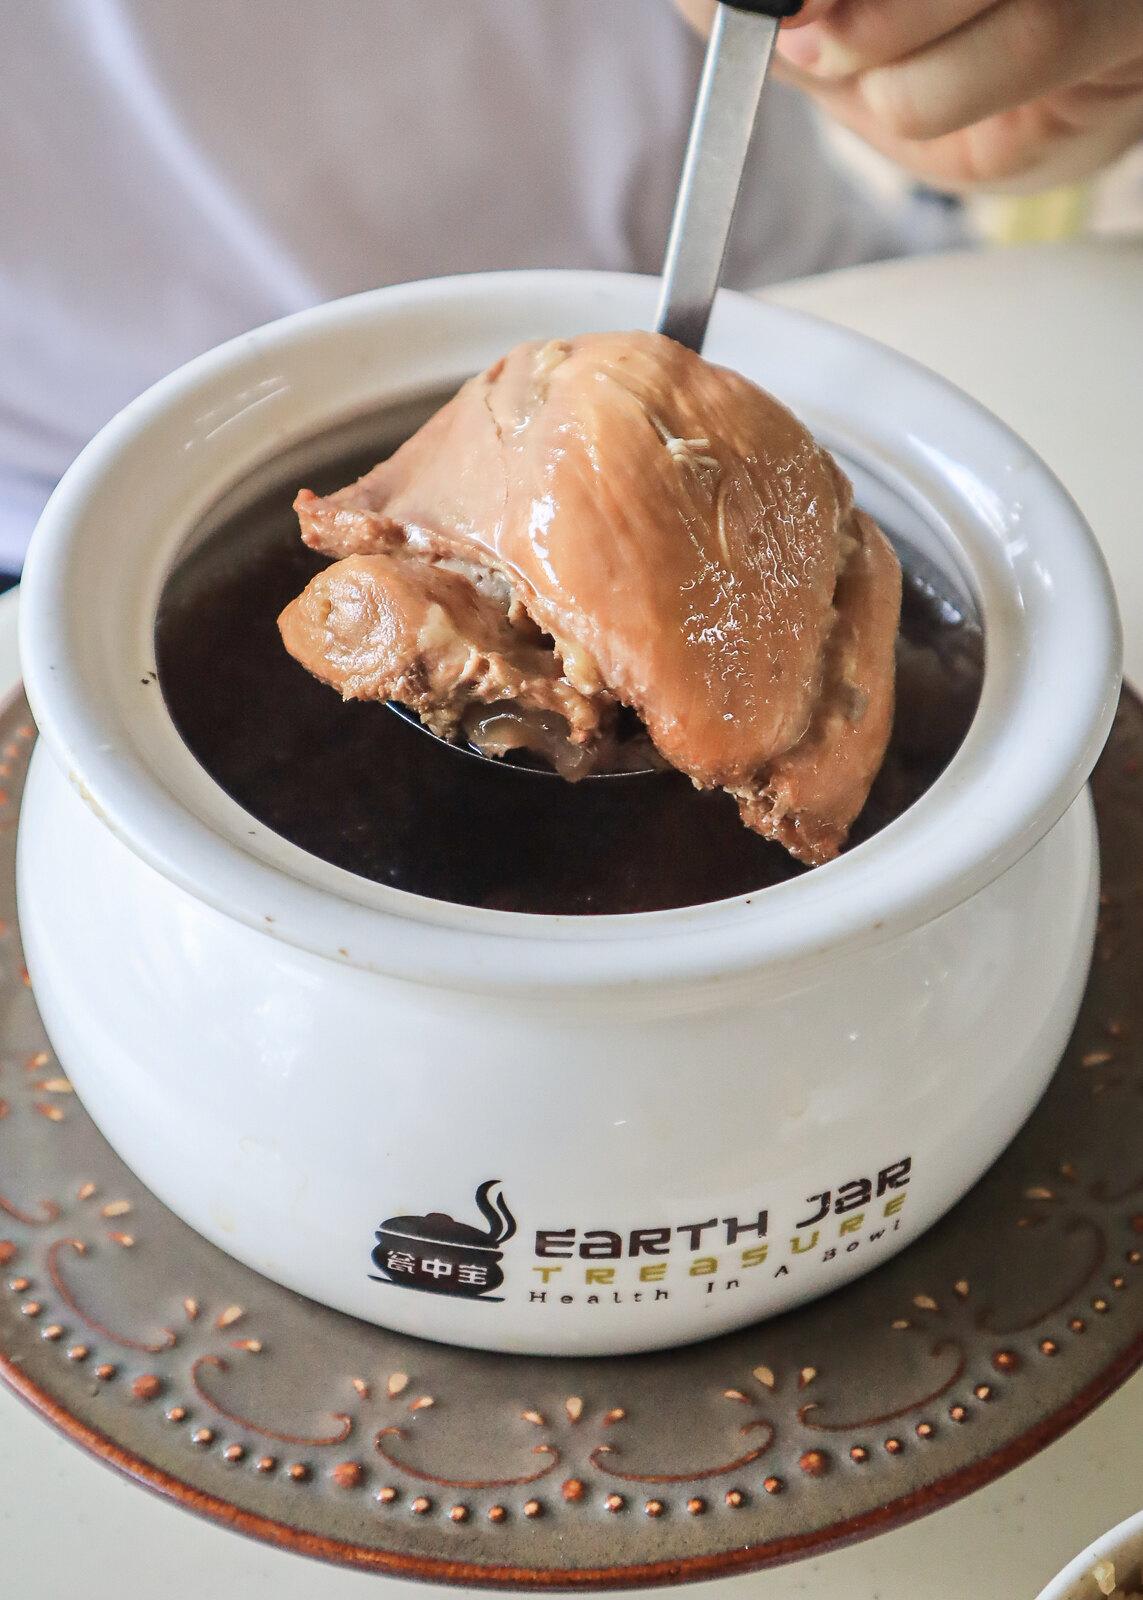 earth jar treasure chicken lift